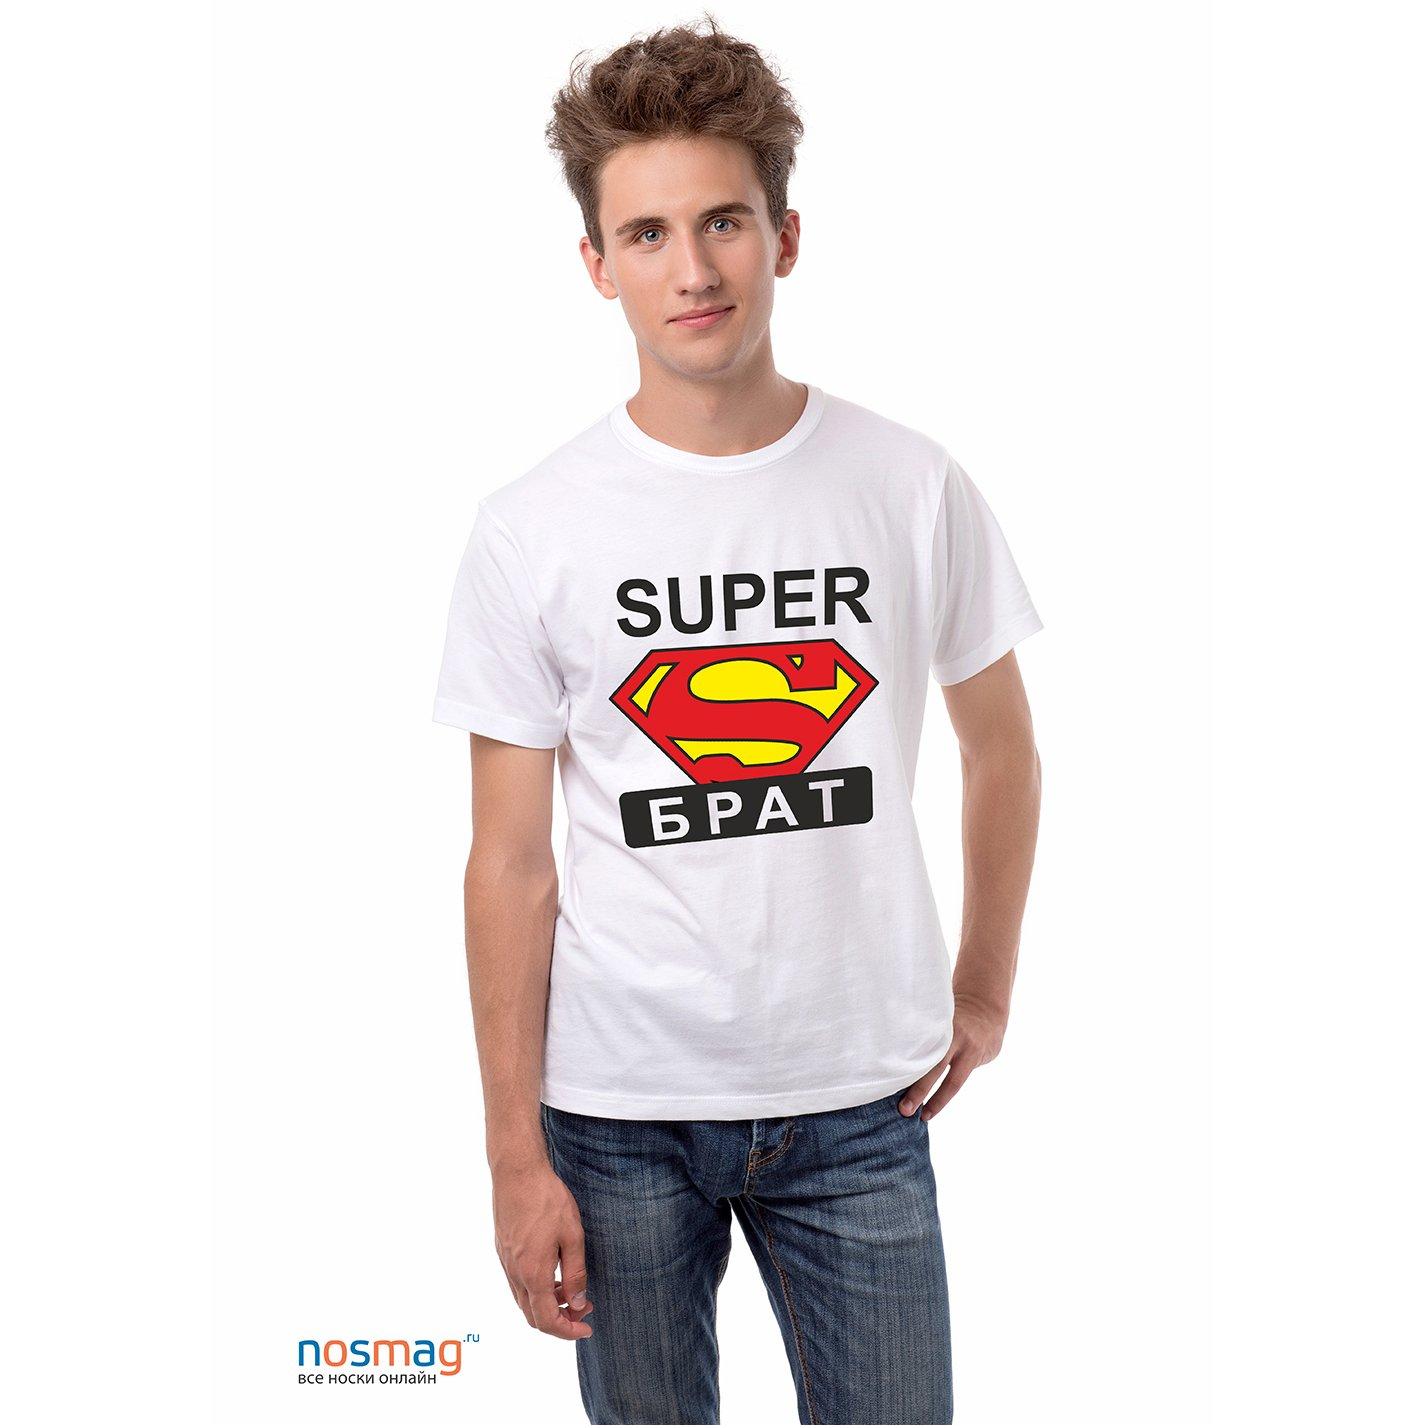 Мужская футболка с рисунком Супер брат